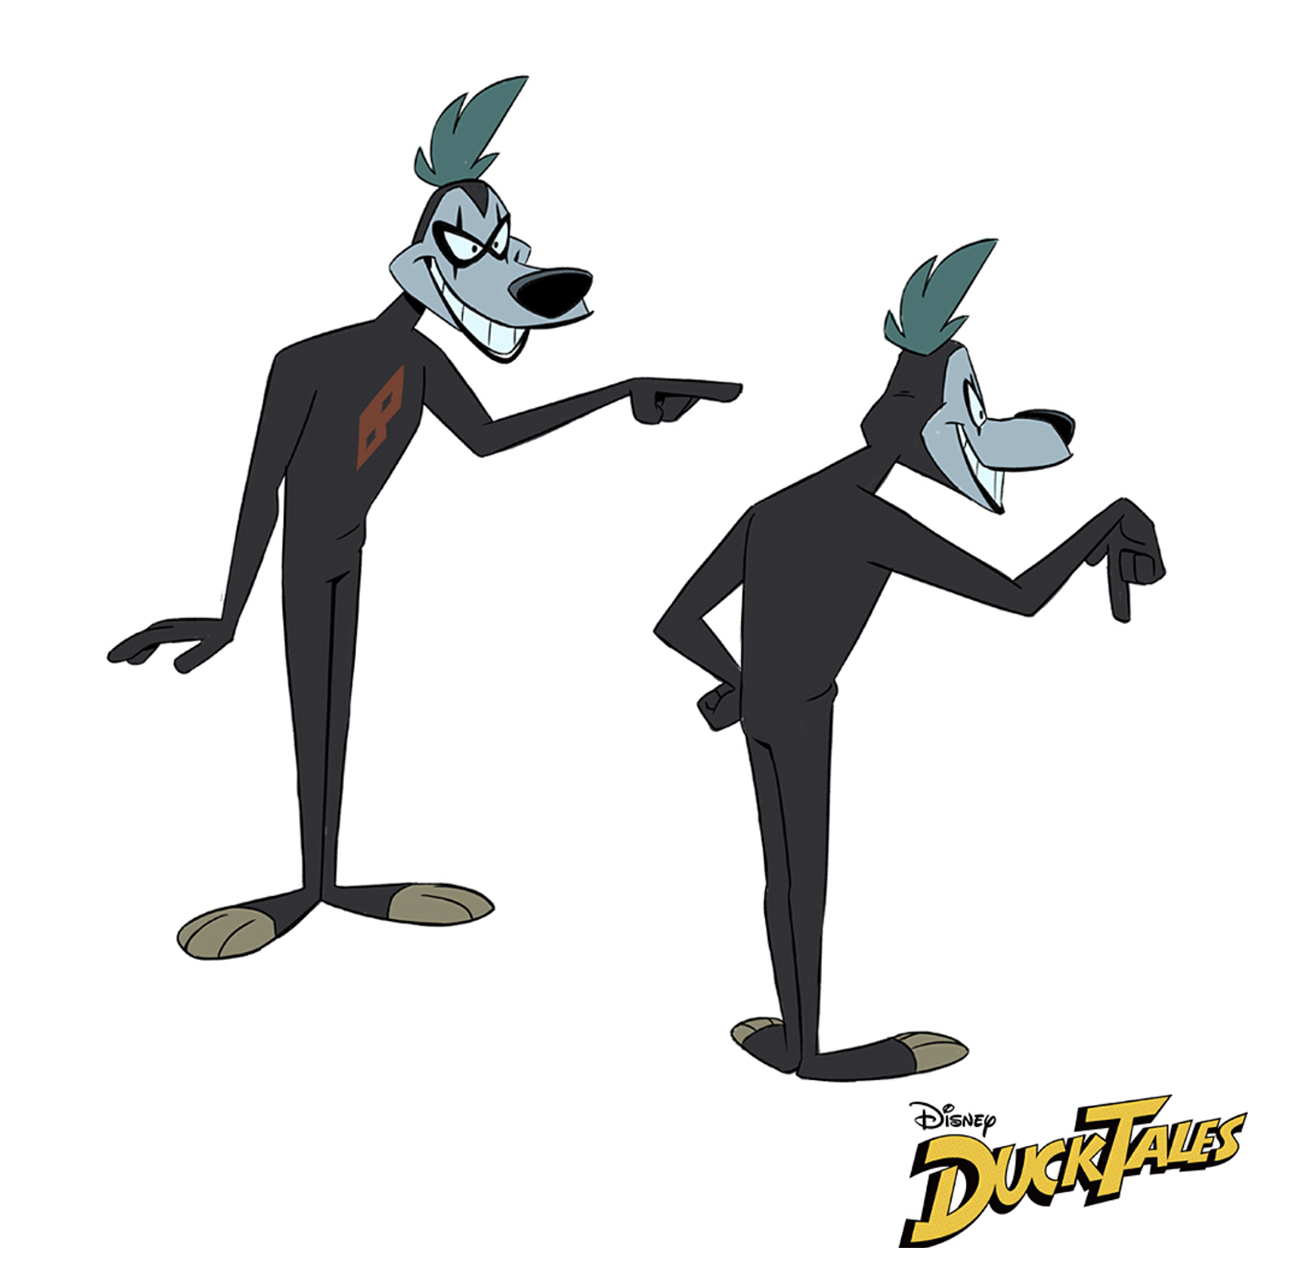 DuckTalesNew - 54.jpg